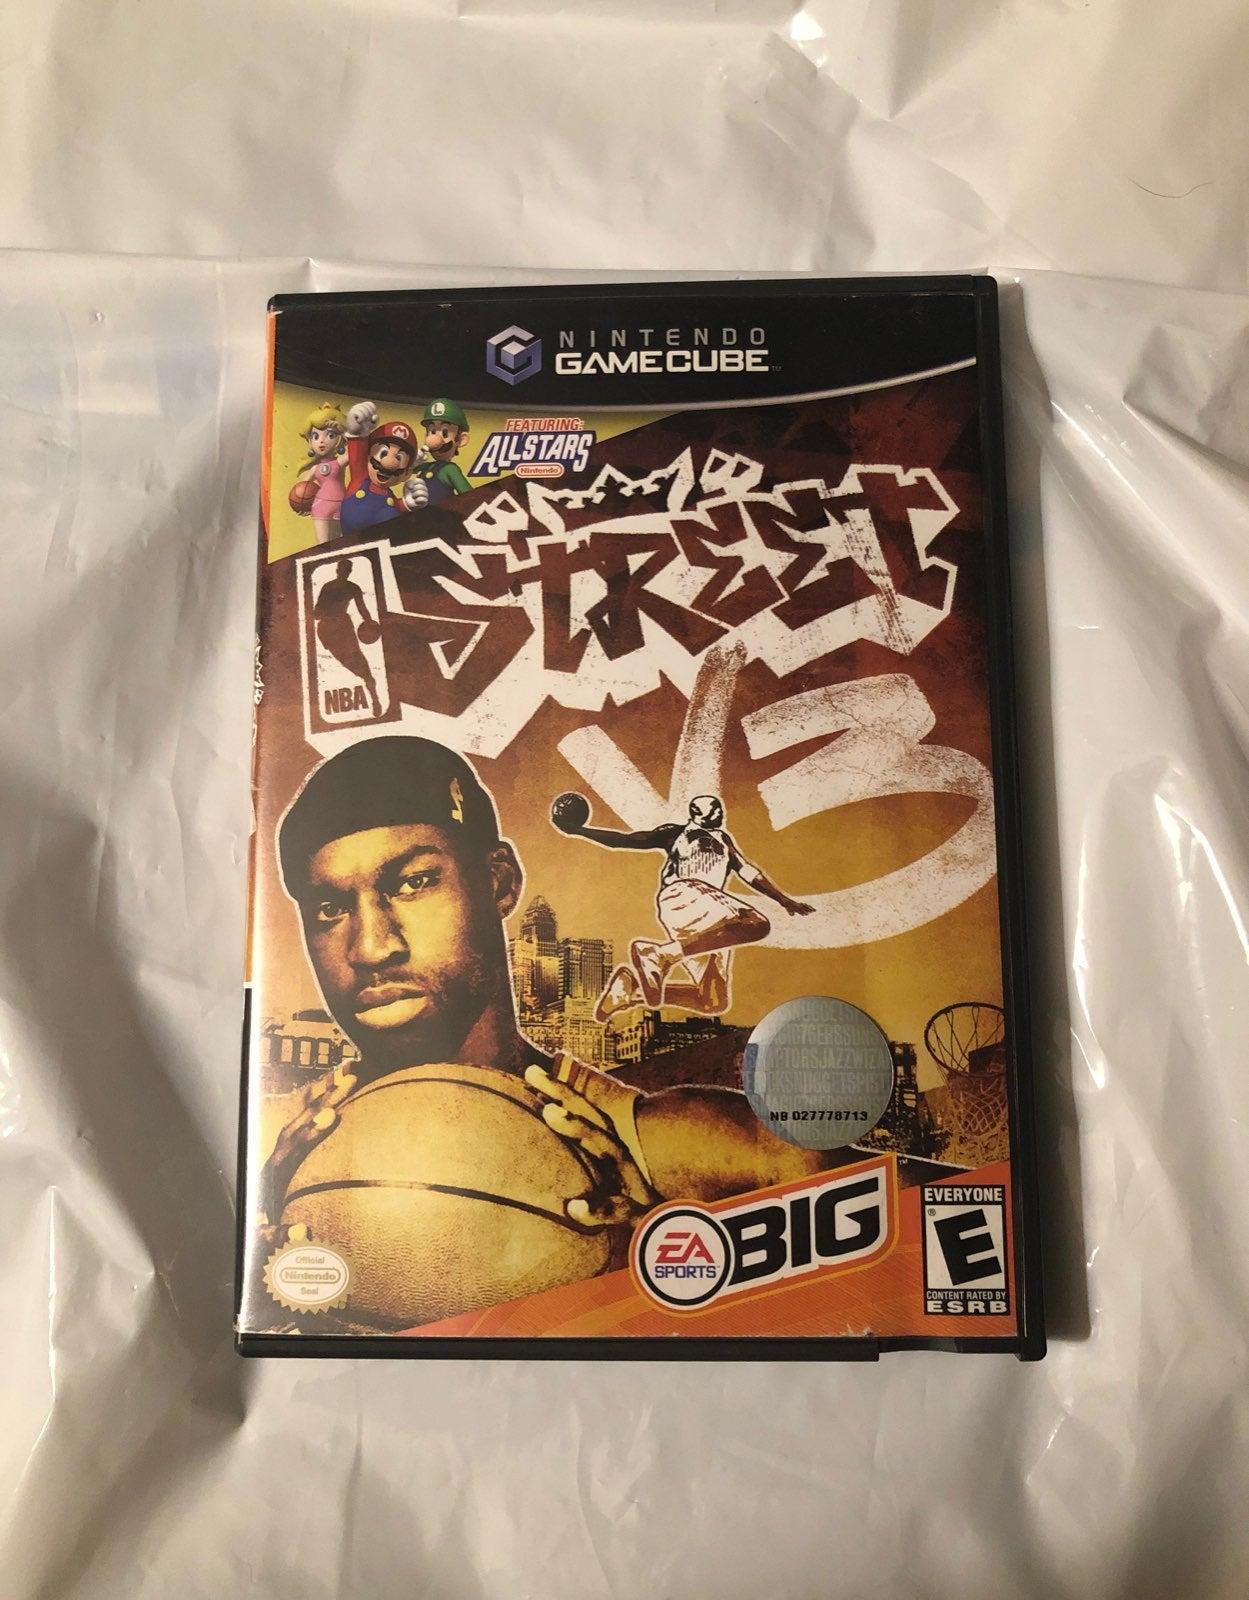 NBA Street V3 on Nintendo GameCube